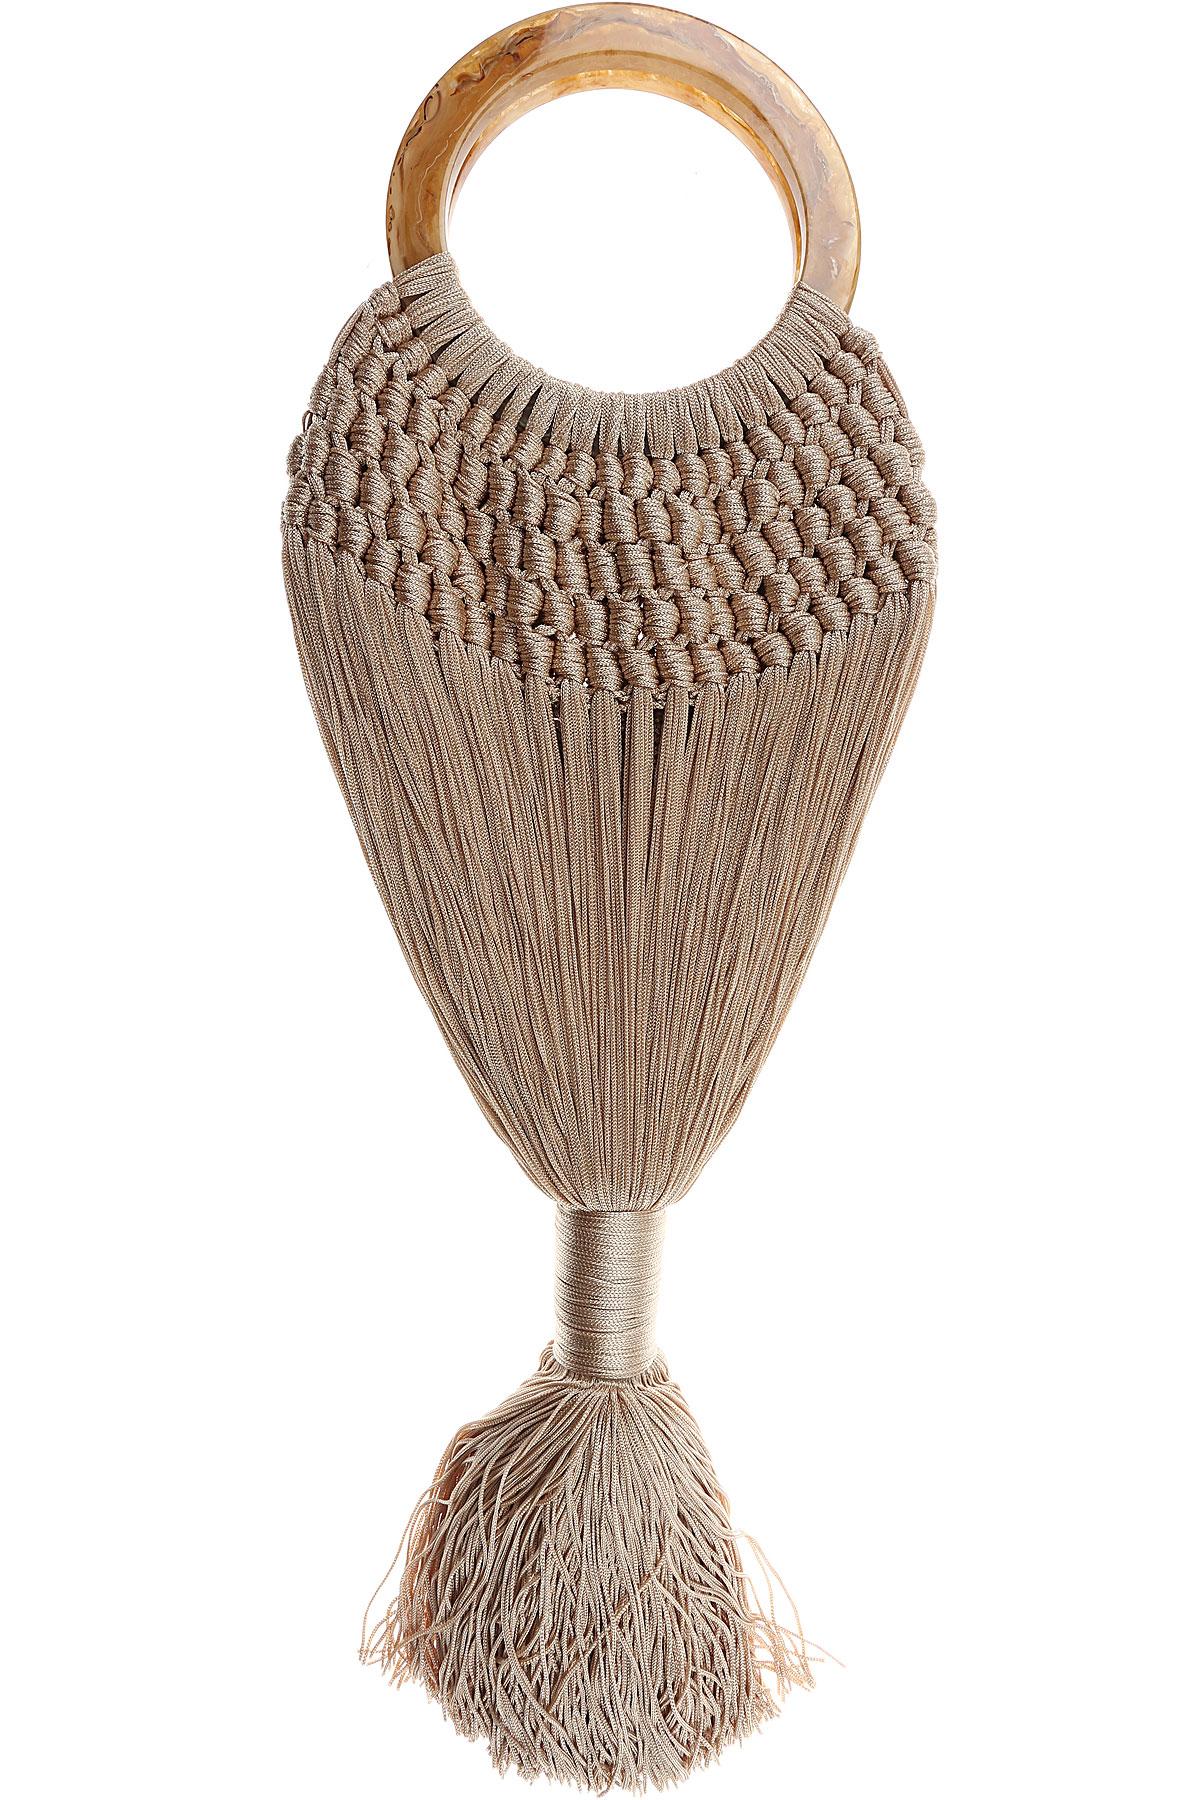 Image of Cult Gaia Handbags, Champagne, Fabric, 2017